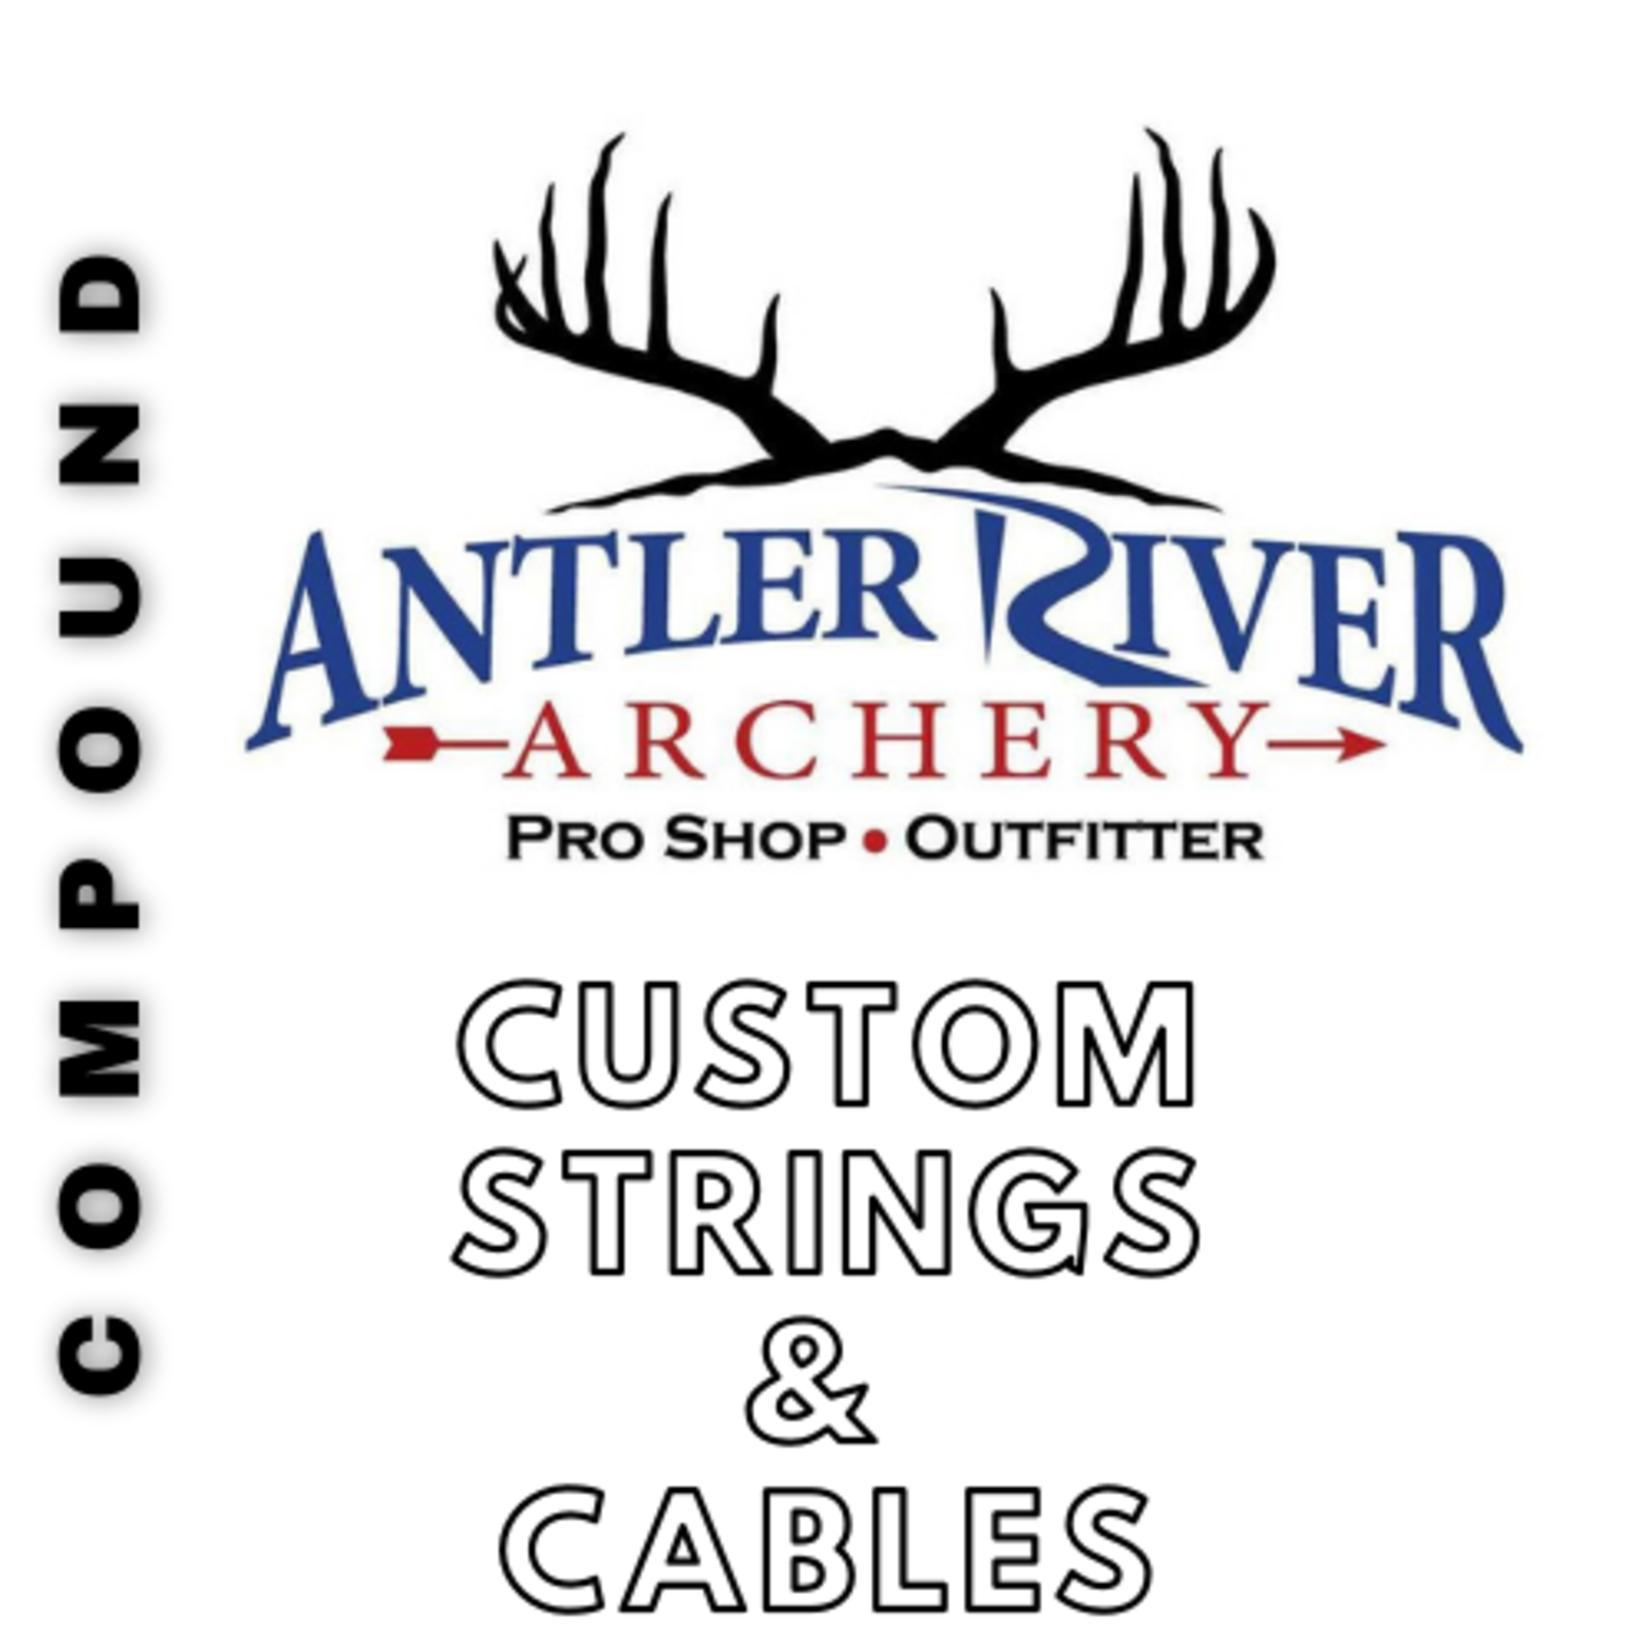 ARA Compound String Cable 2 Colour